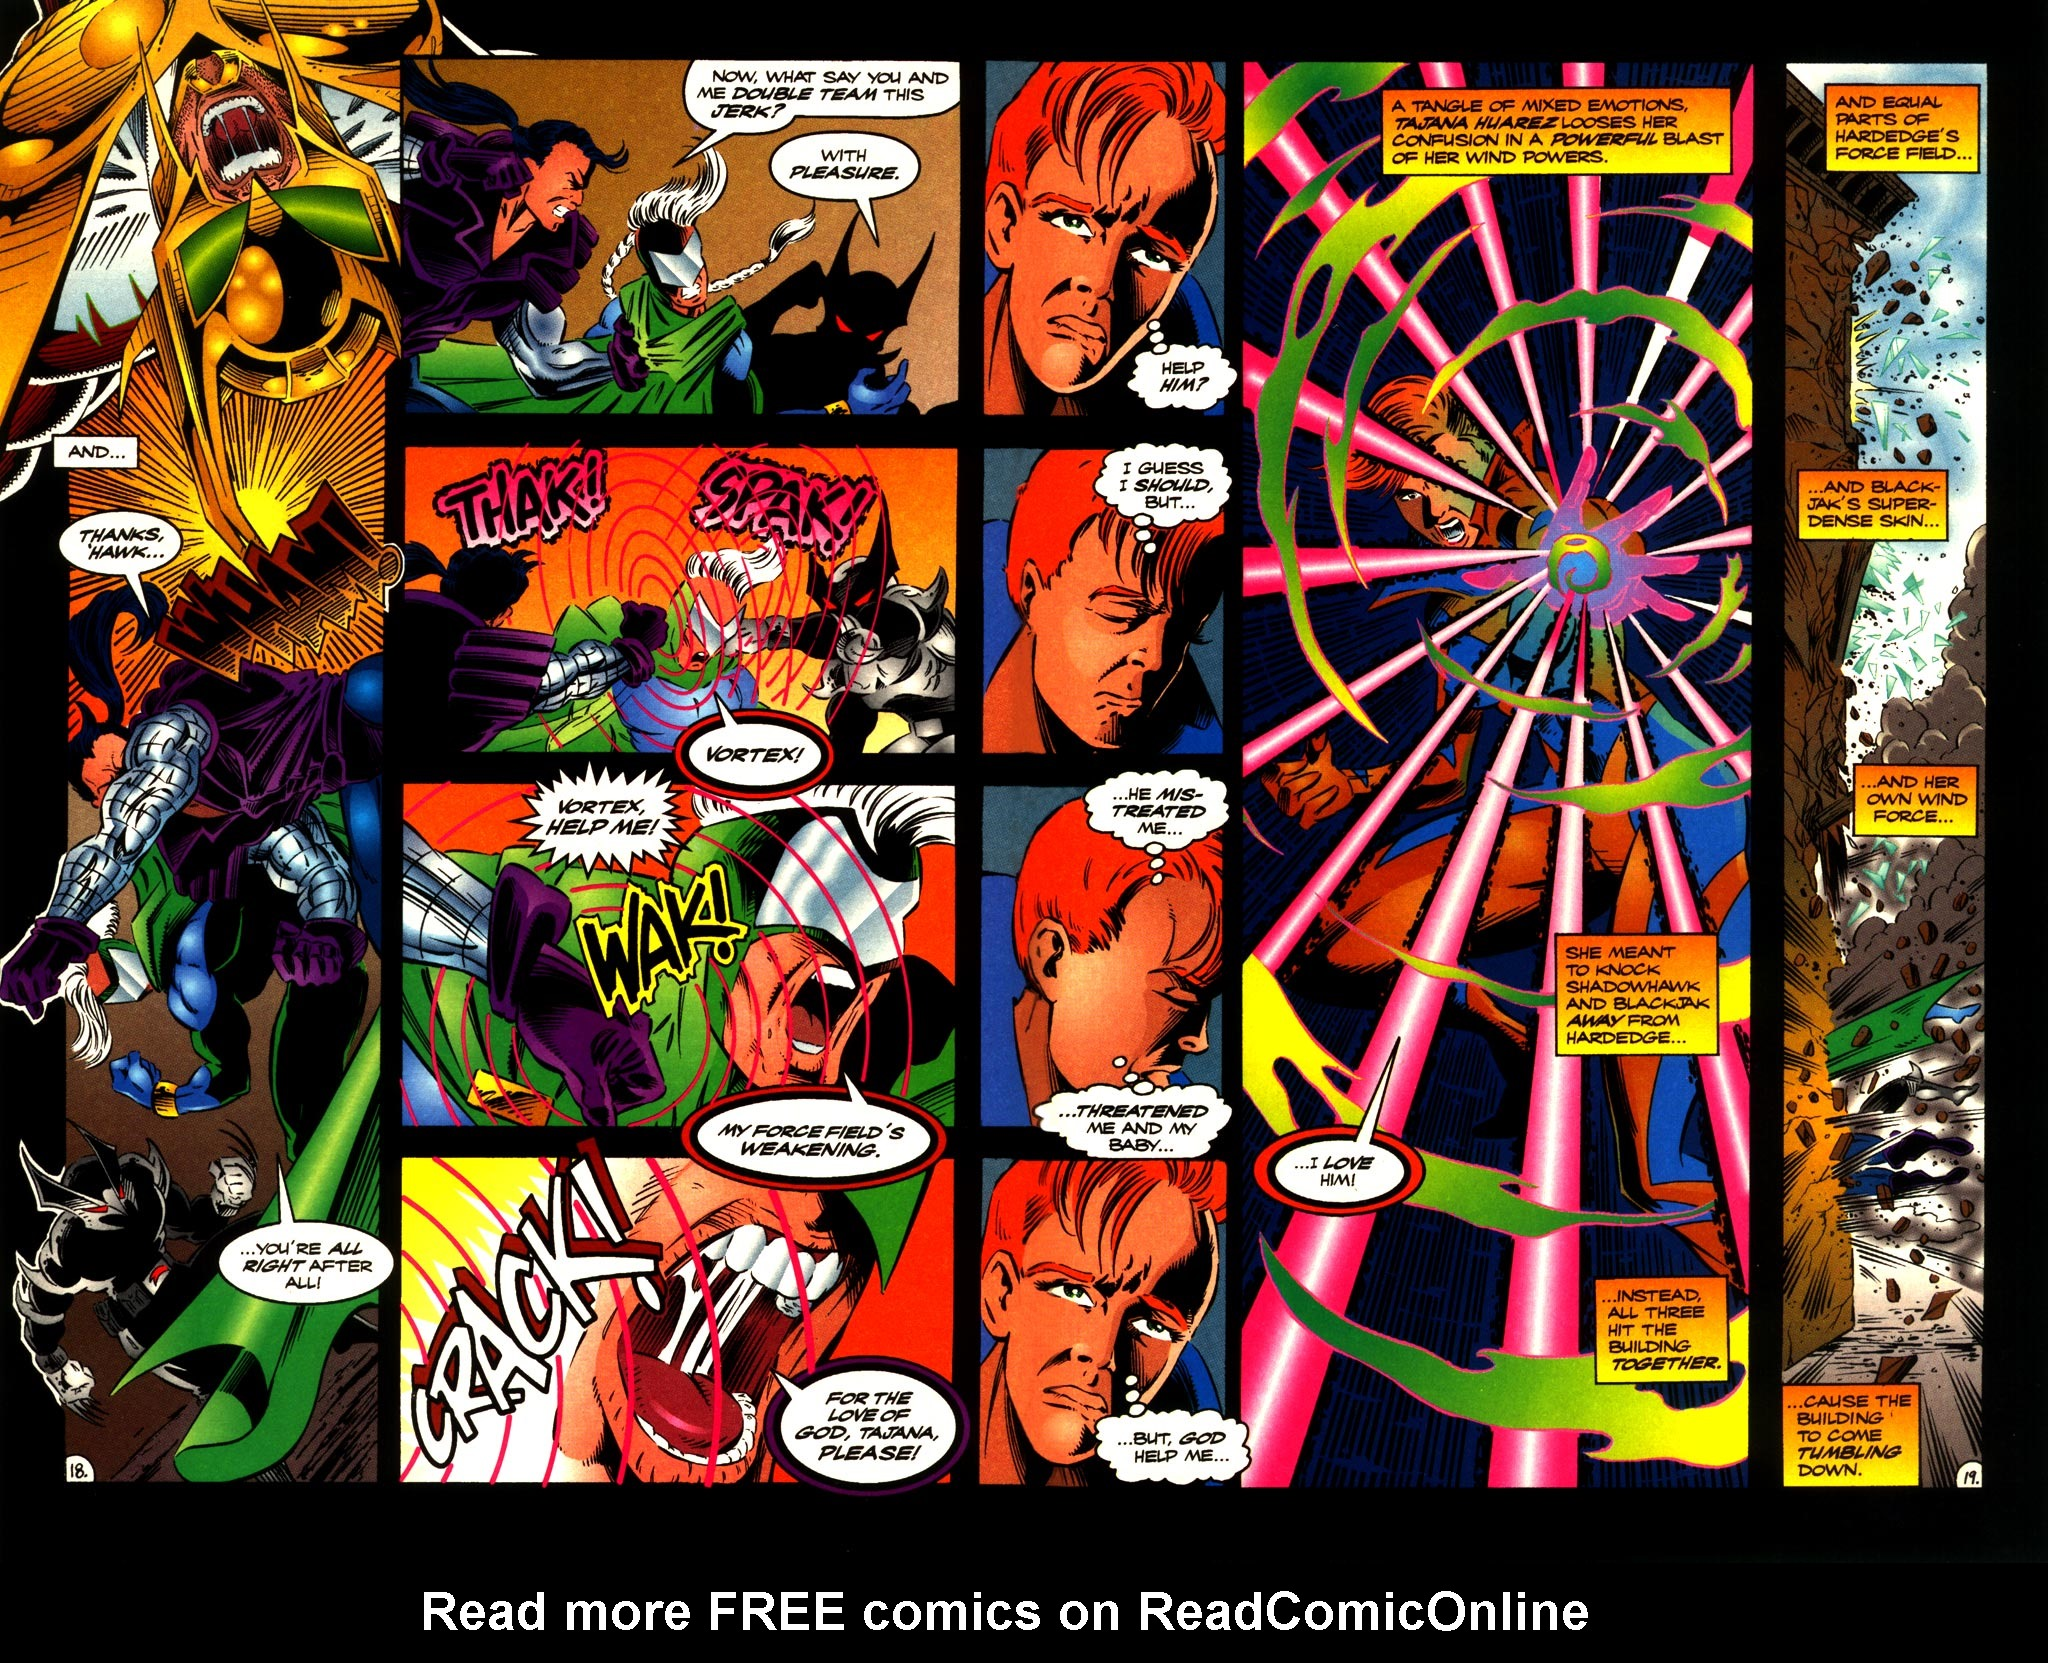 Read online ShadowHawk comic -  Issue #10 - 20